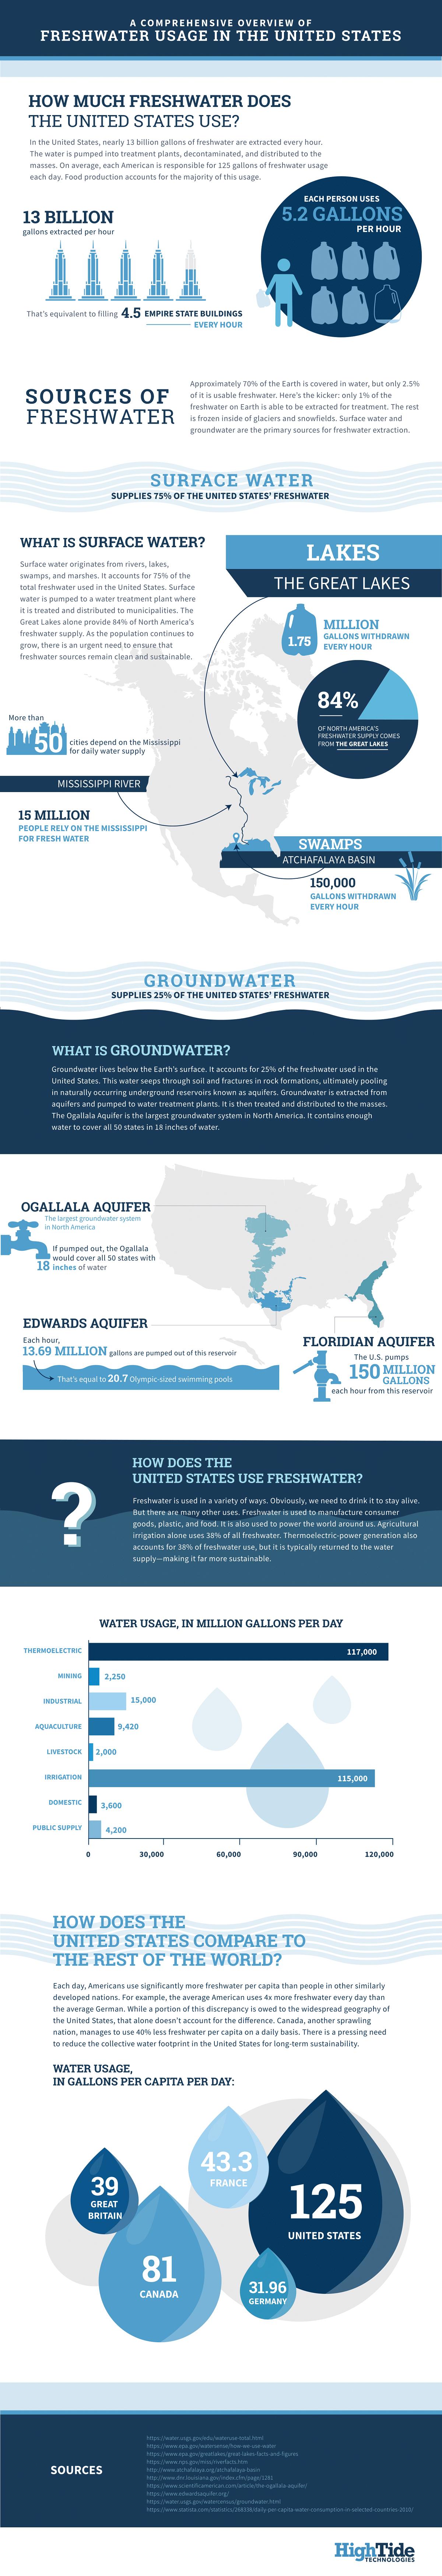 Comprehensive Freshwater info